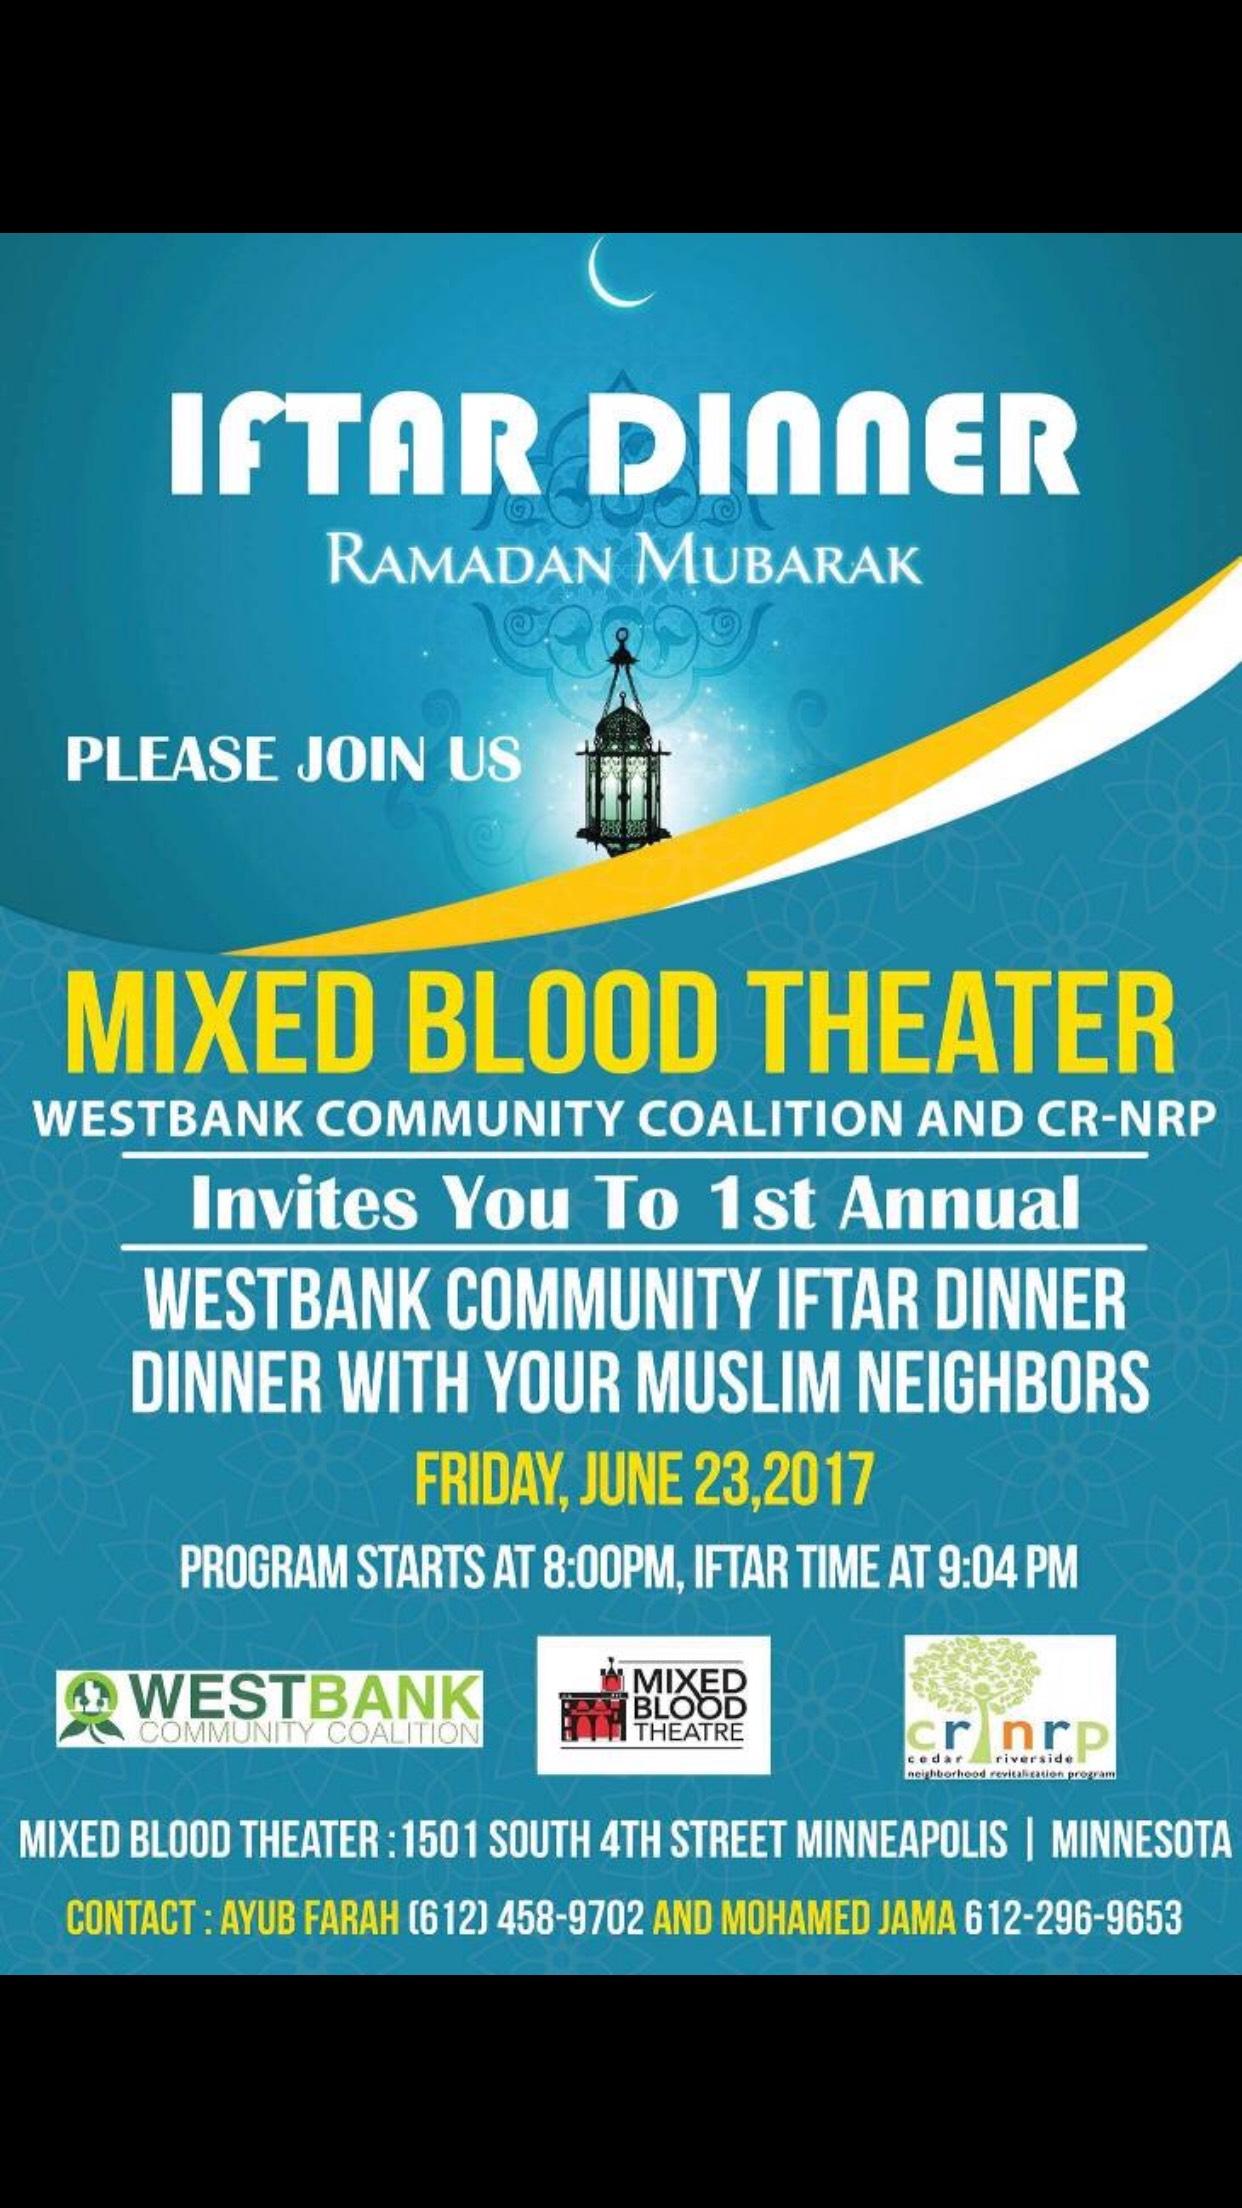 IftarAnnouncement_062217.jpg